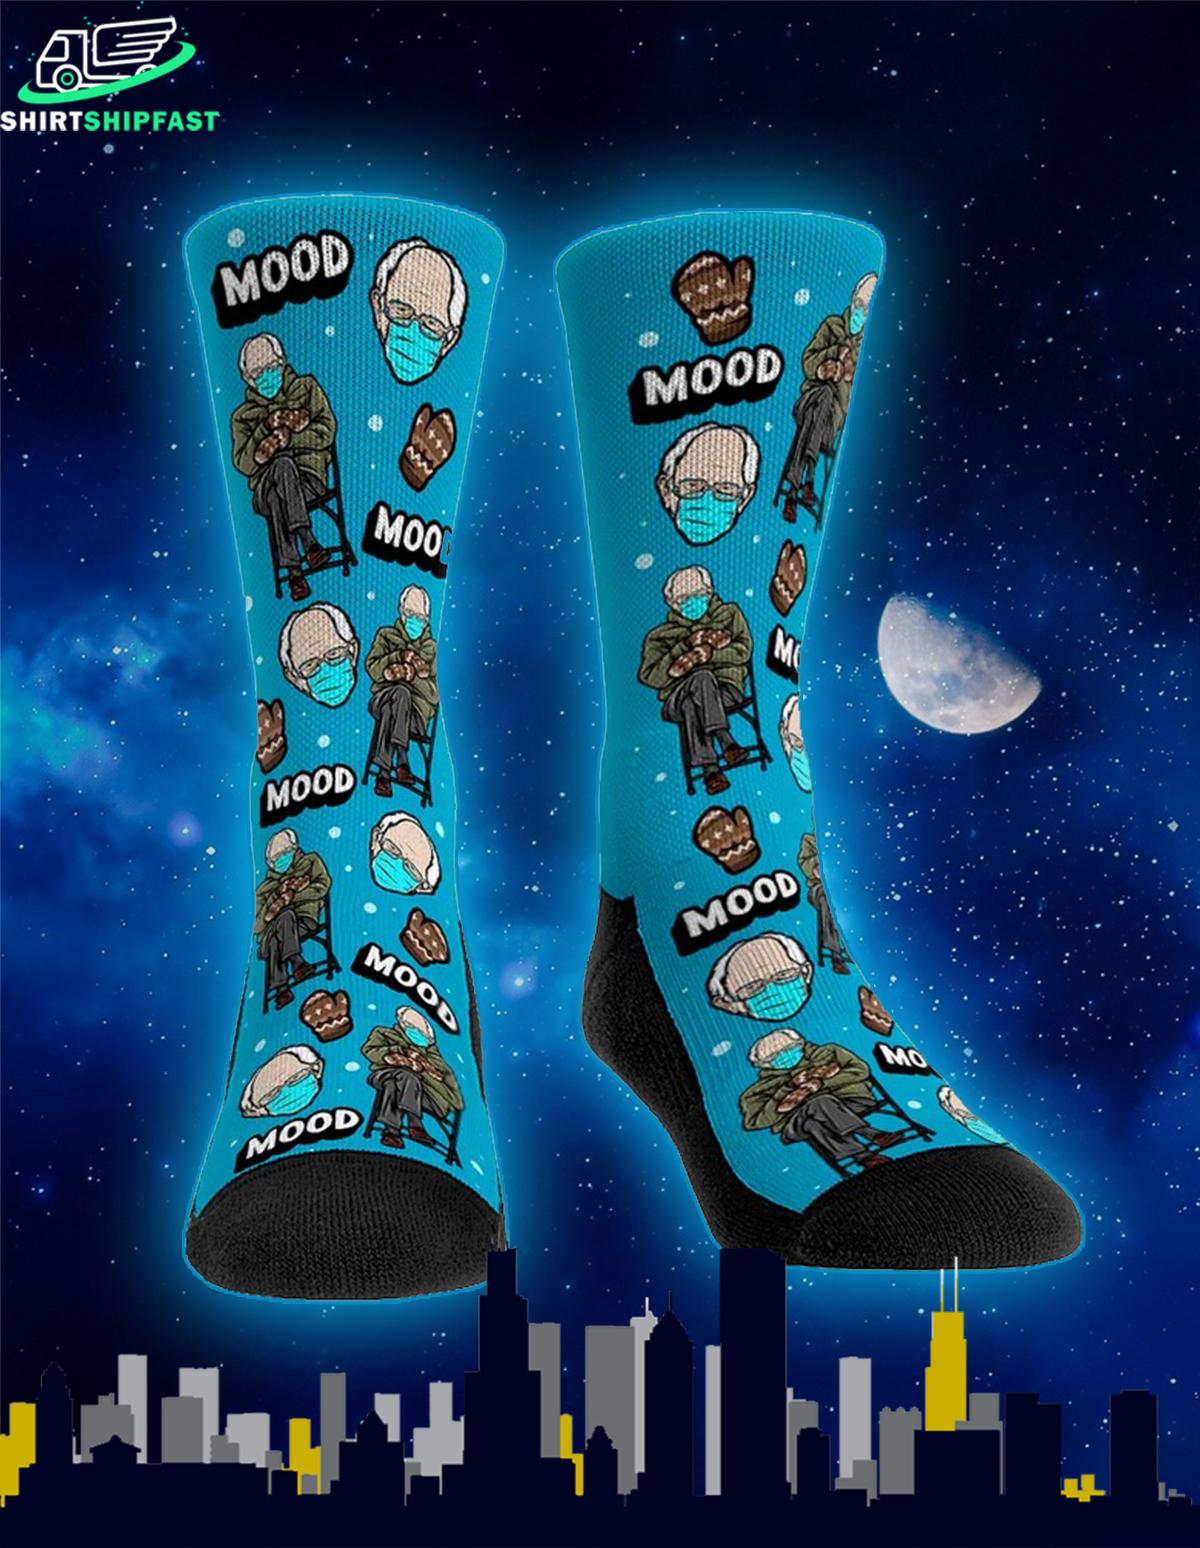 Bernie sanders inauguration meme socks - Picture 1